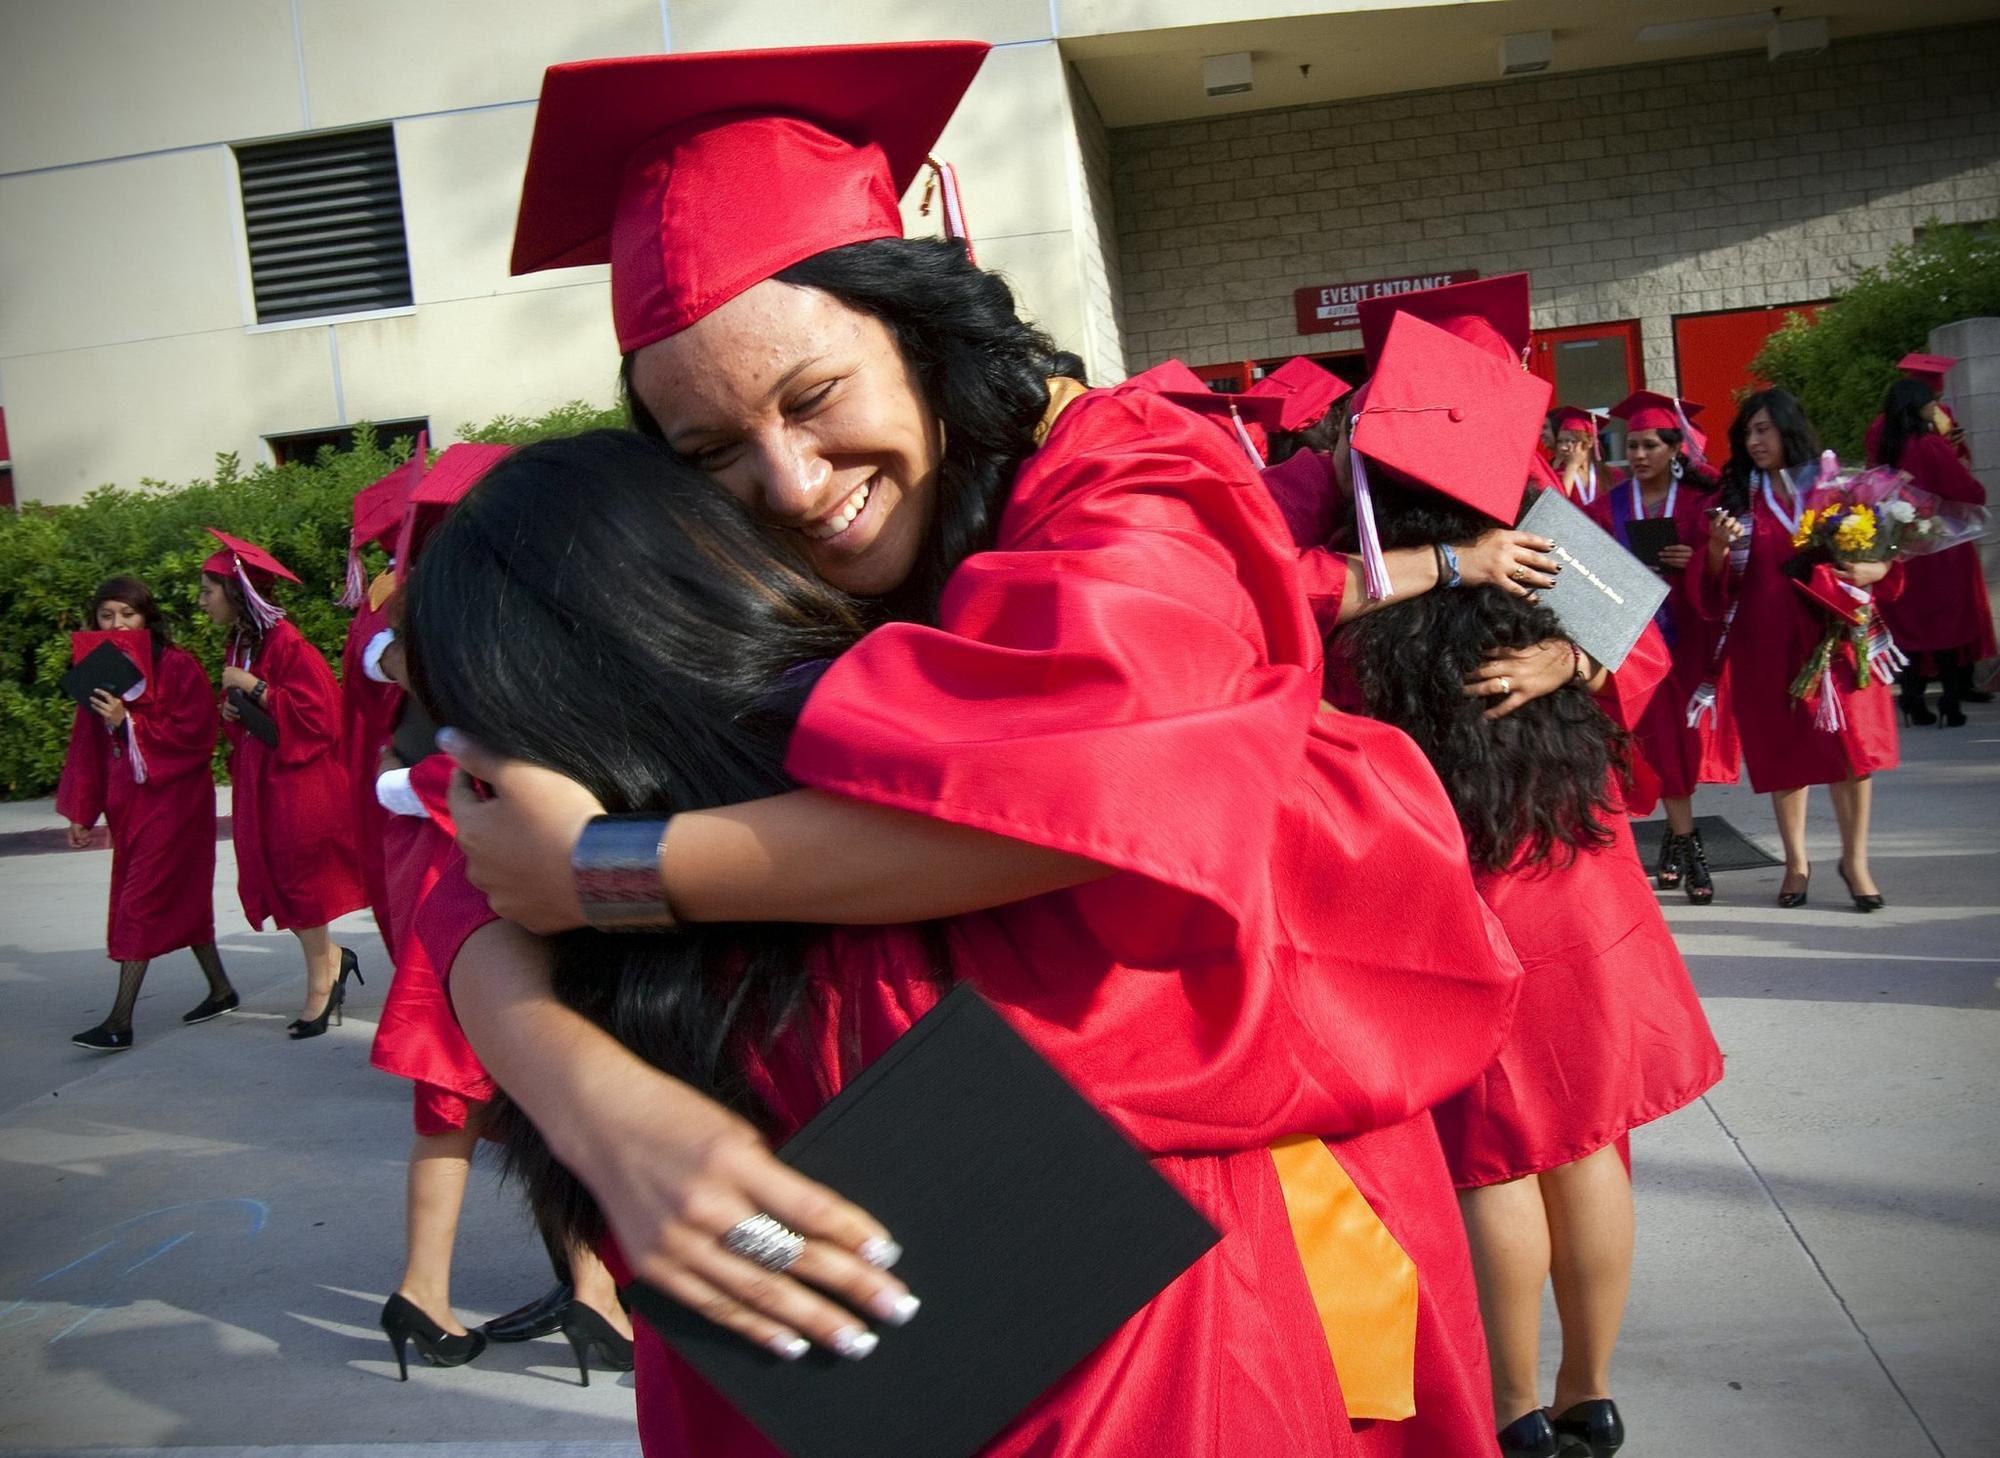 June 10, 2011, San Diego, California, USA ....................    |At Hoover High School's graduation held on campus at SDSU, Viejas Arena, graduates Mayreni Olea  and Daisy Merc